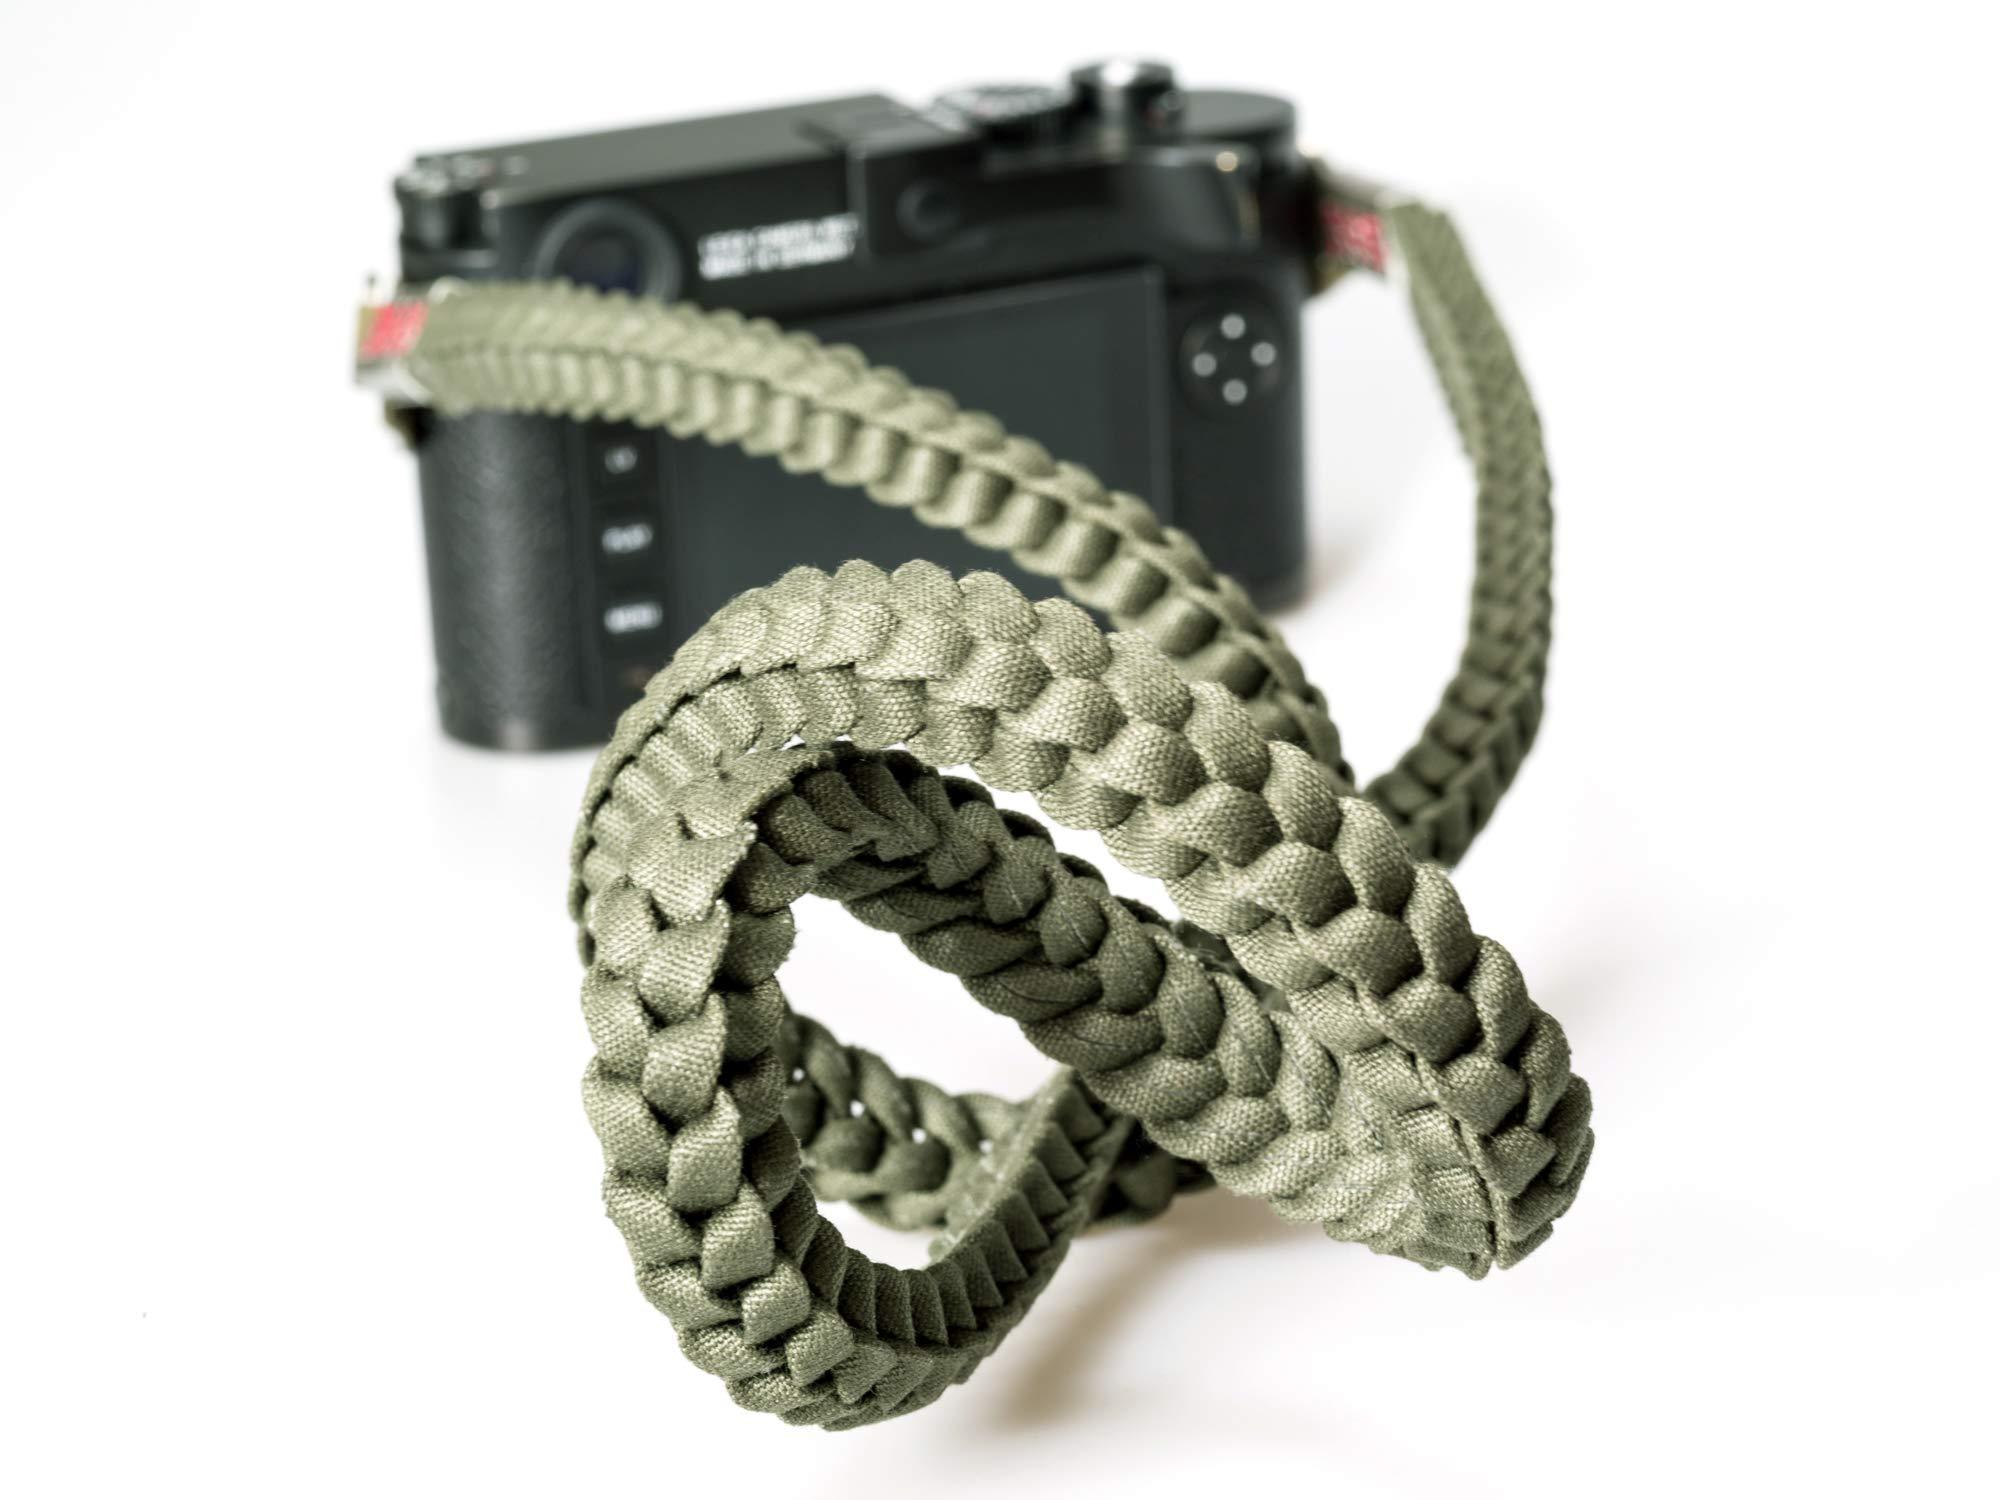 Barton 1972 Designer Braided Muddy Green Military Camera Neck Strap Lint Free Cotton 42'' Long w/Carry Bag Leica Sony Fuji Olympus Nikon